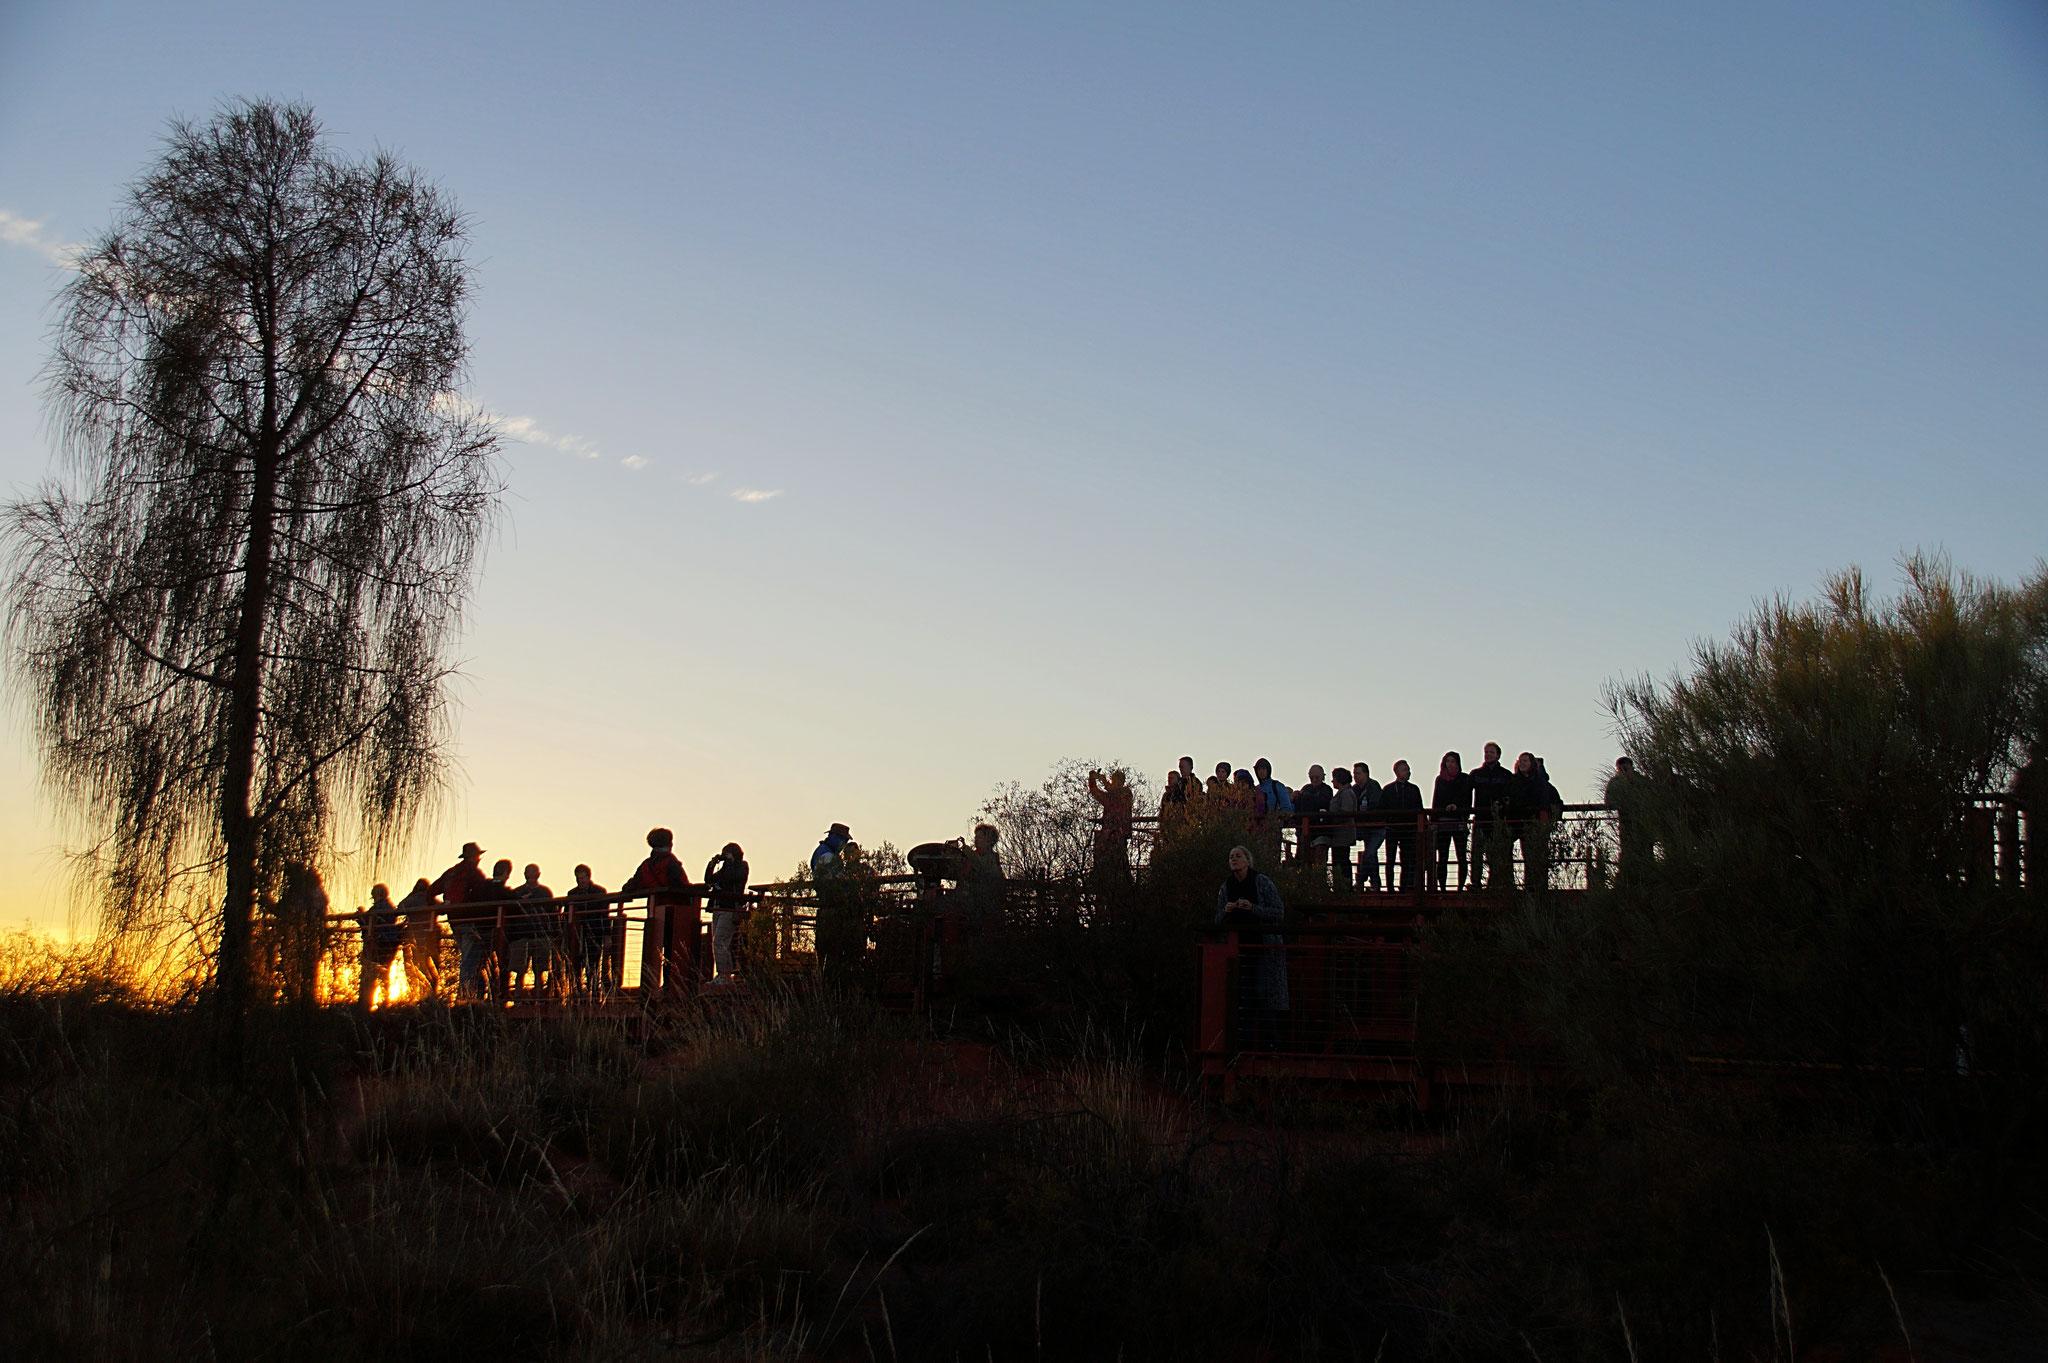 Early Birds auf der Holztribüne der Sunrise Viewing Area.